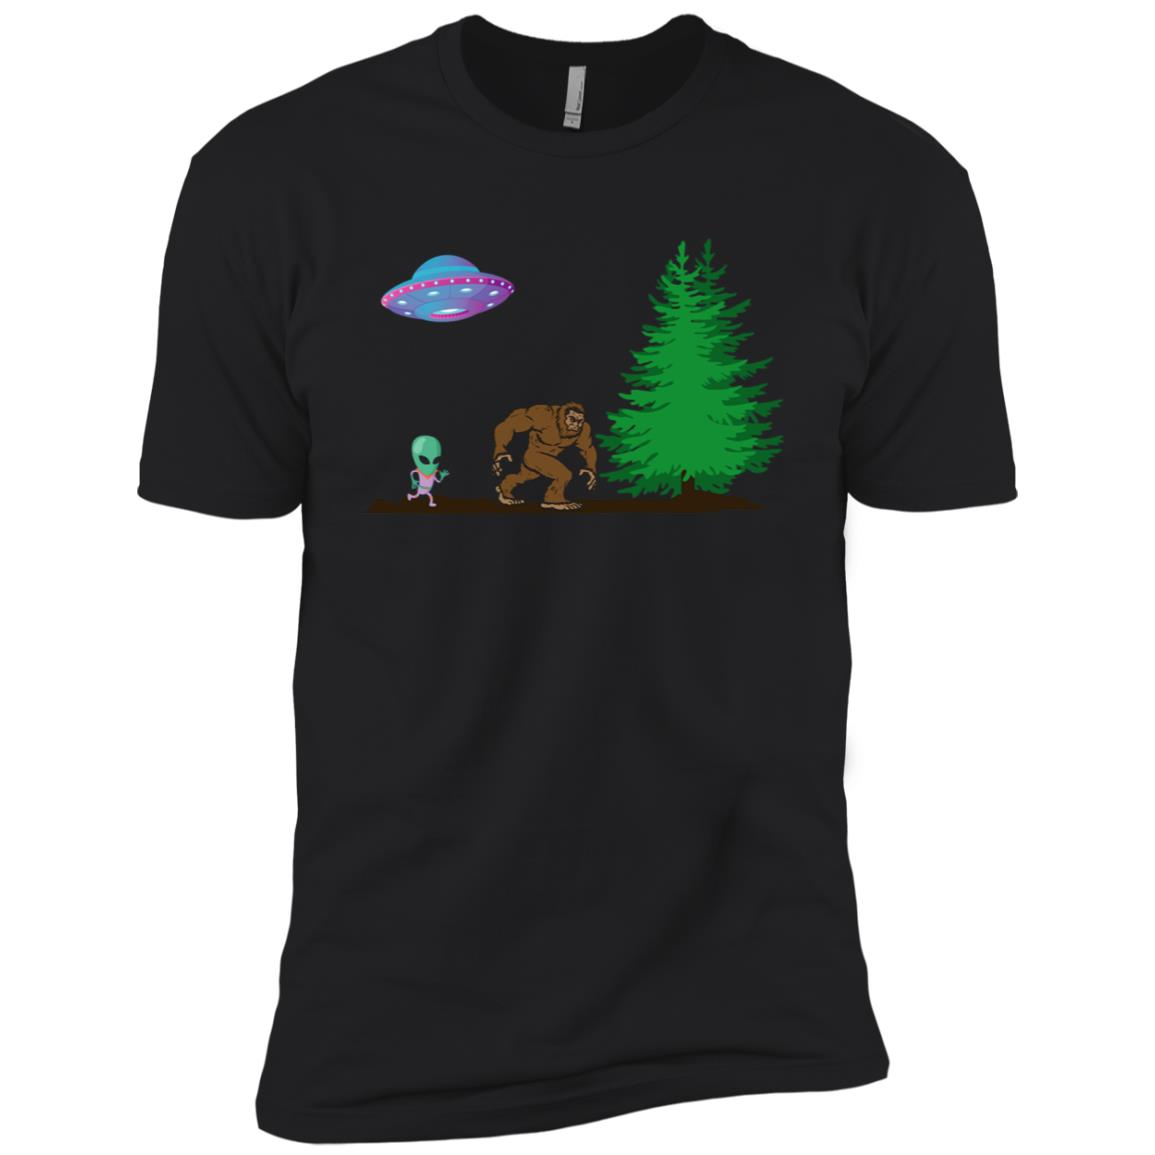 Bigfoot & Cute UFO Alien Spacecraft Men Short Sleeve T-Shirt